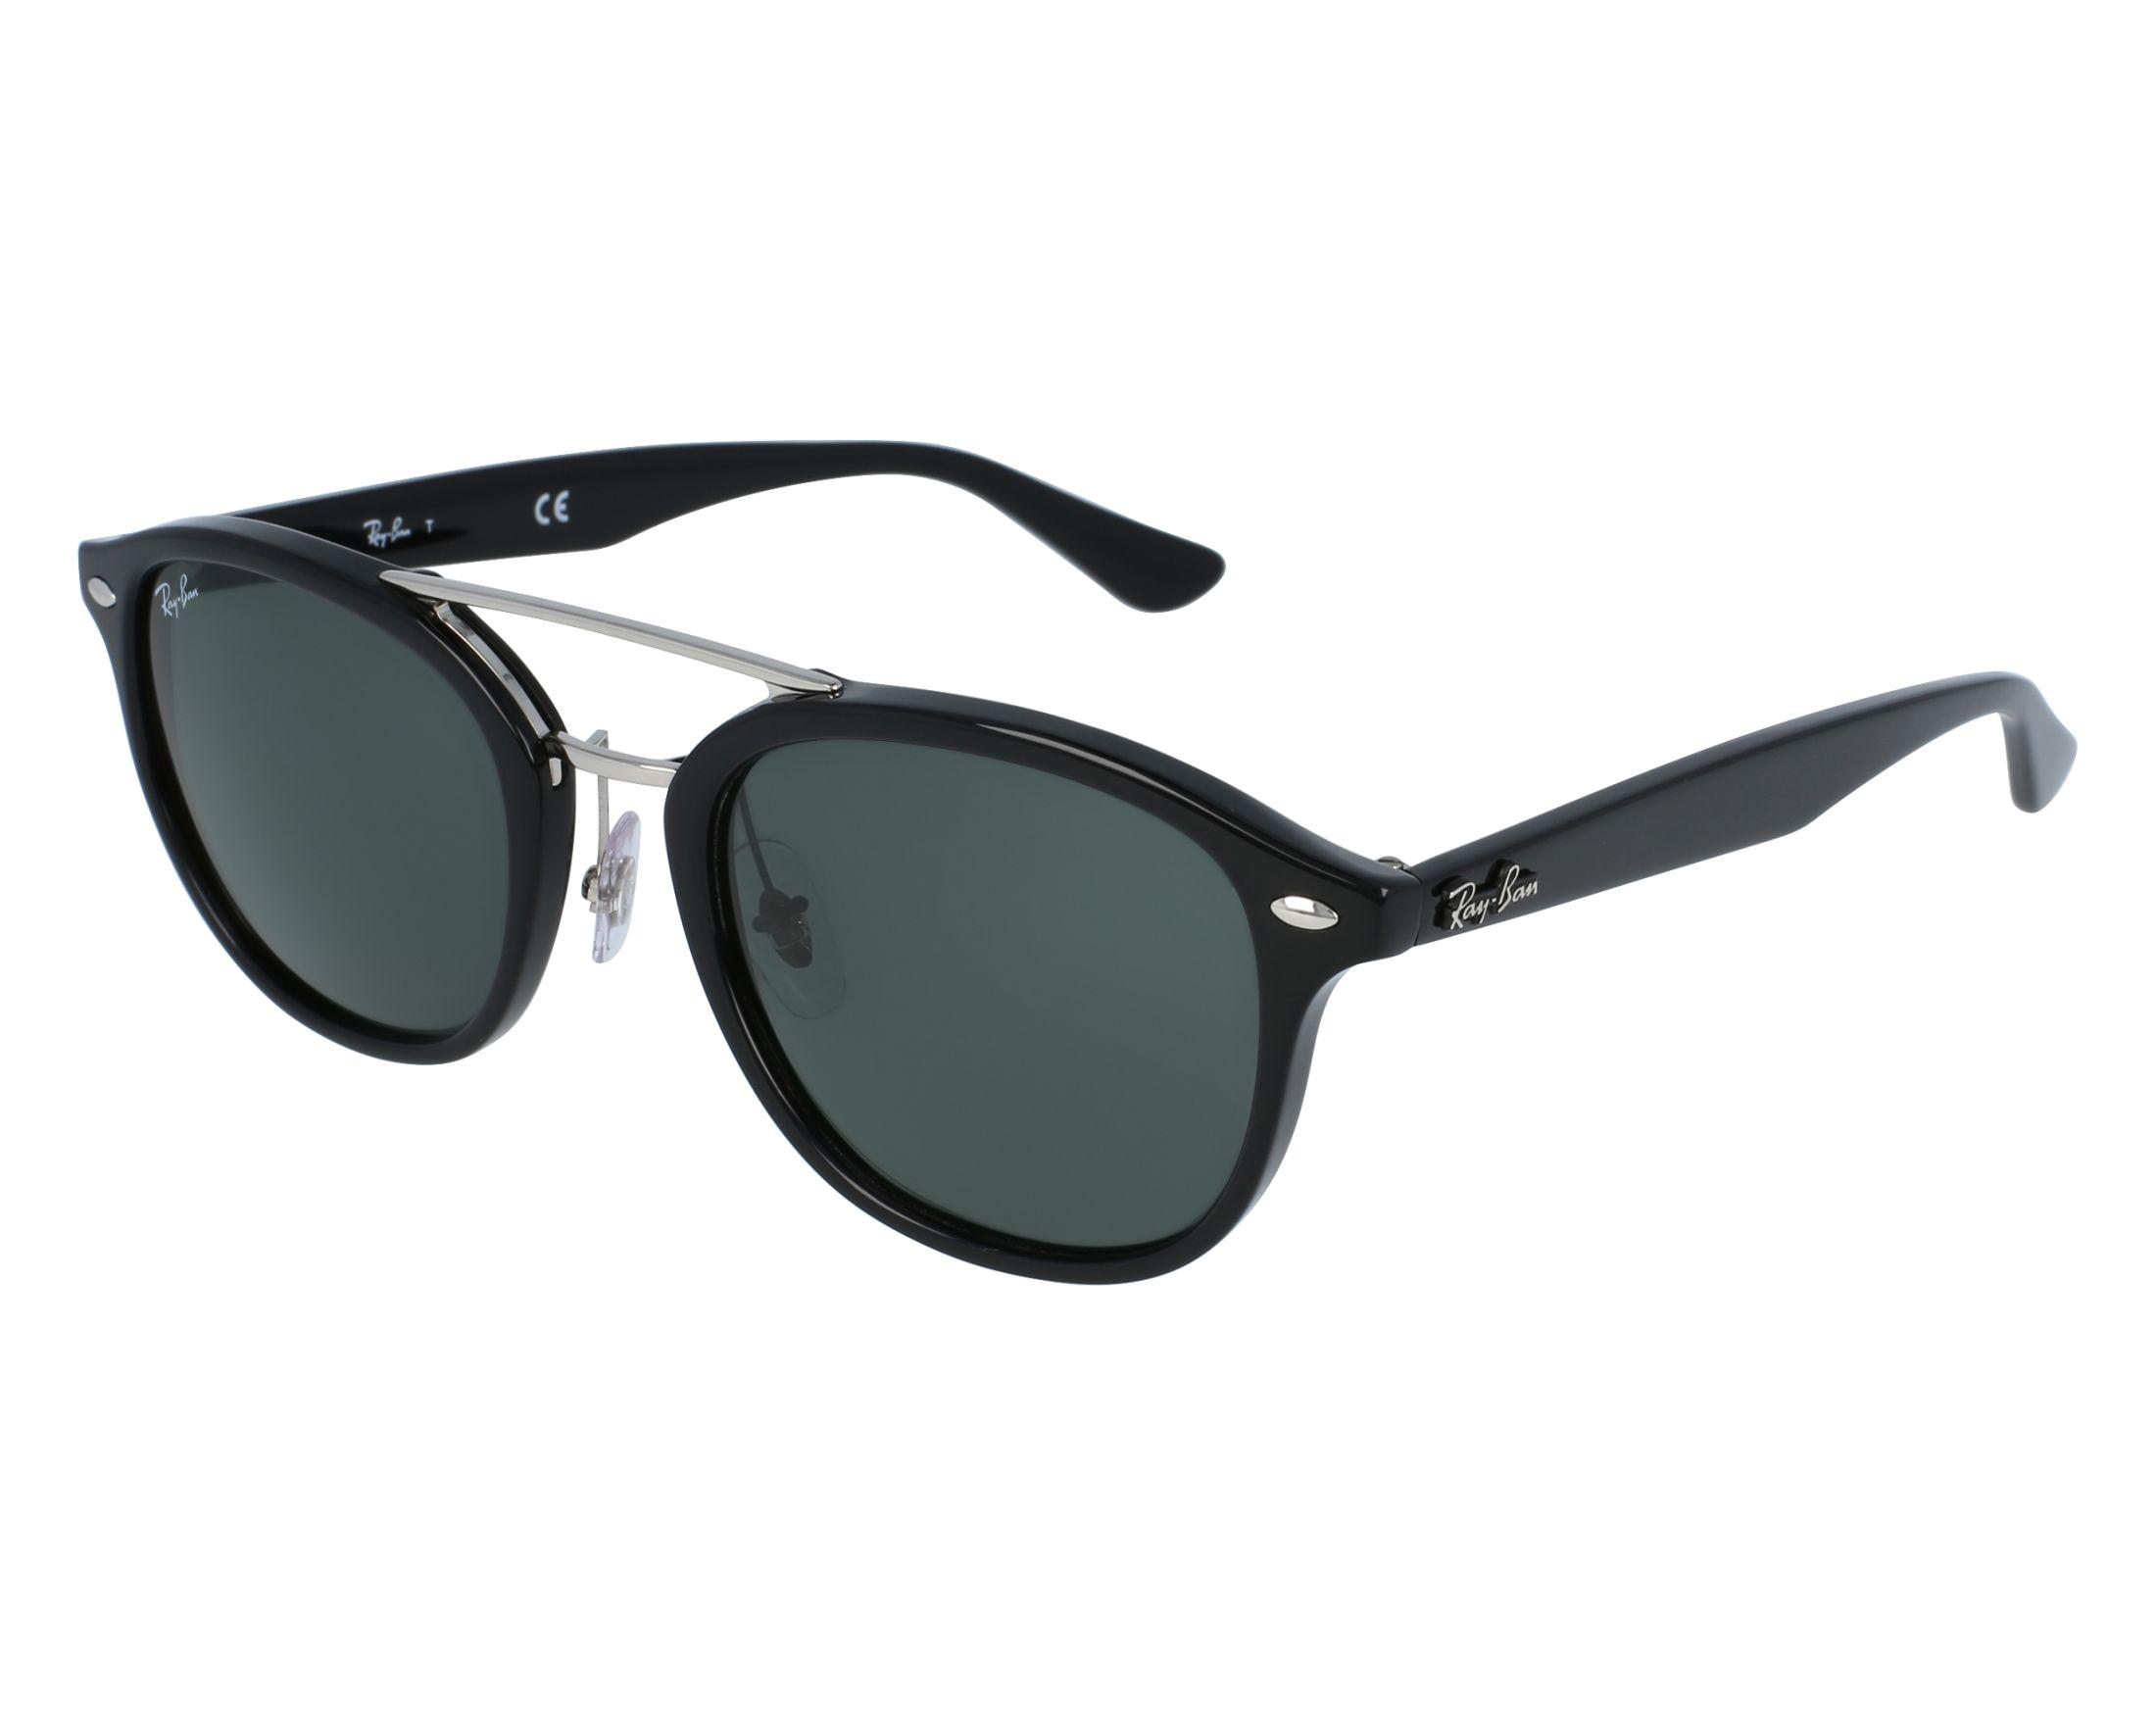 e385d8fe4e Sunglasses Ray-Ban RB-2183 901 71 53-21 Black front view